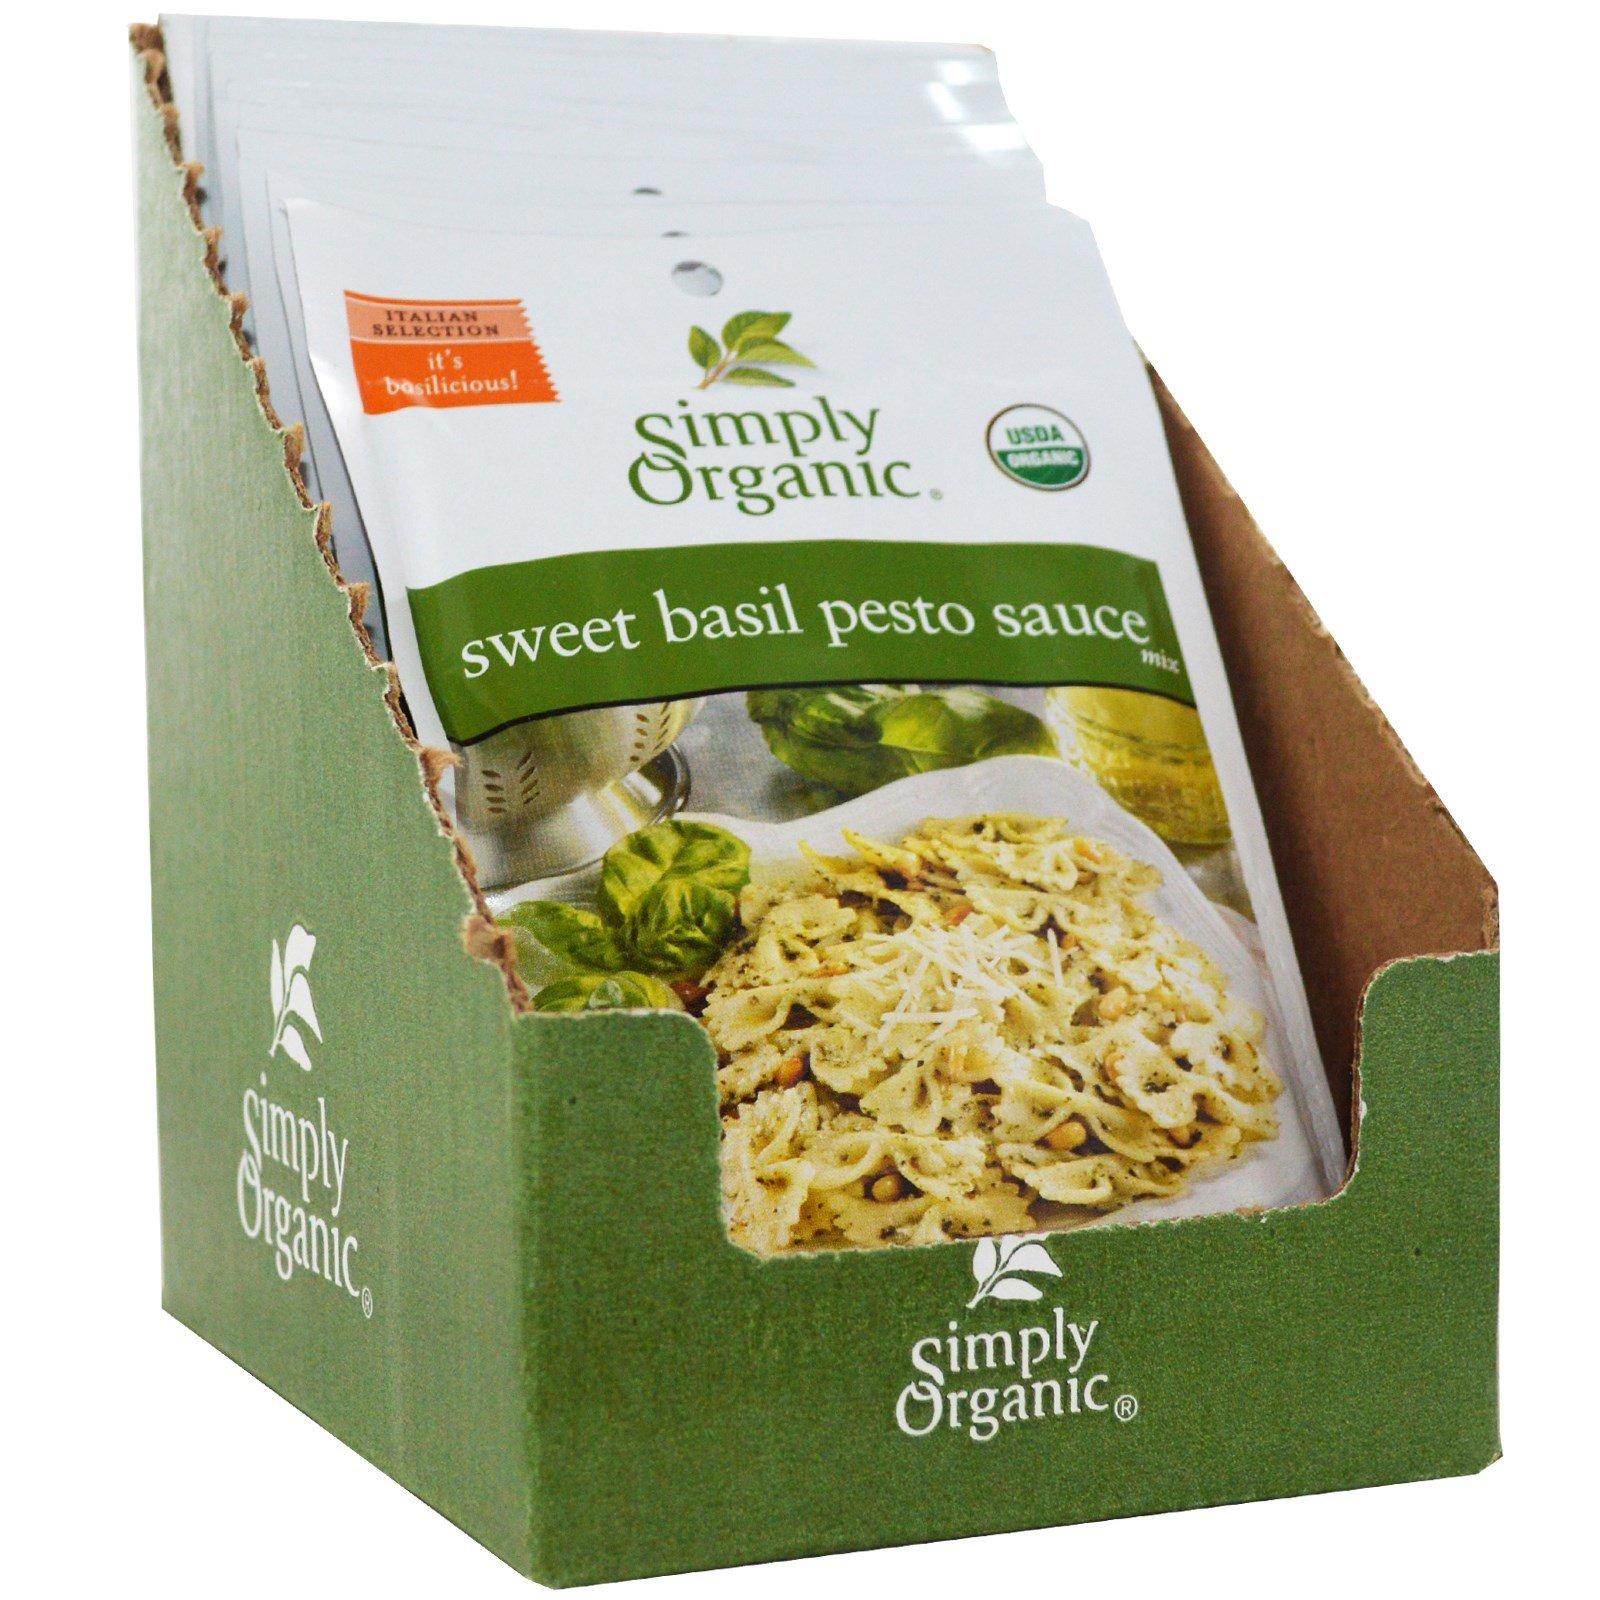 Simply Organic, Sweet Basil Pesto Sauce Mix, 12 Packets, 0.53 oz (15 g) Each - 2pcs